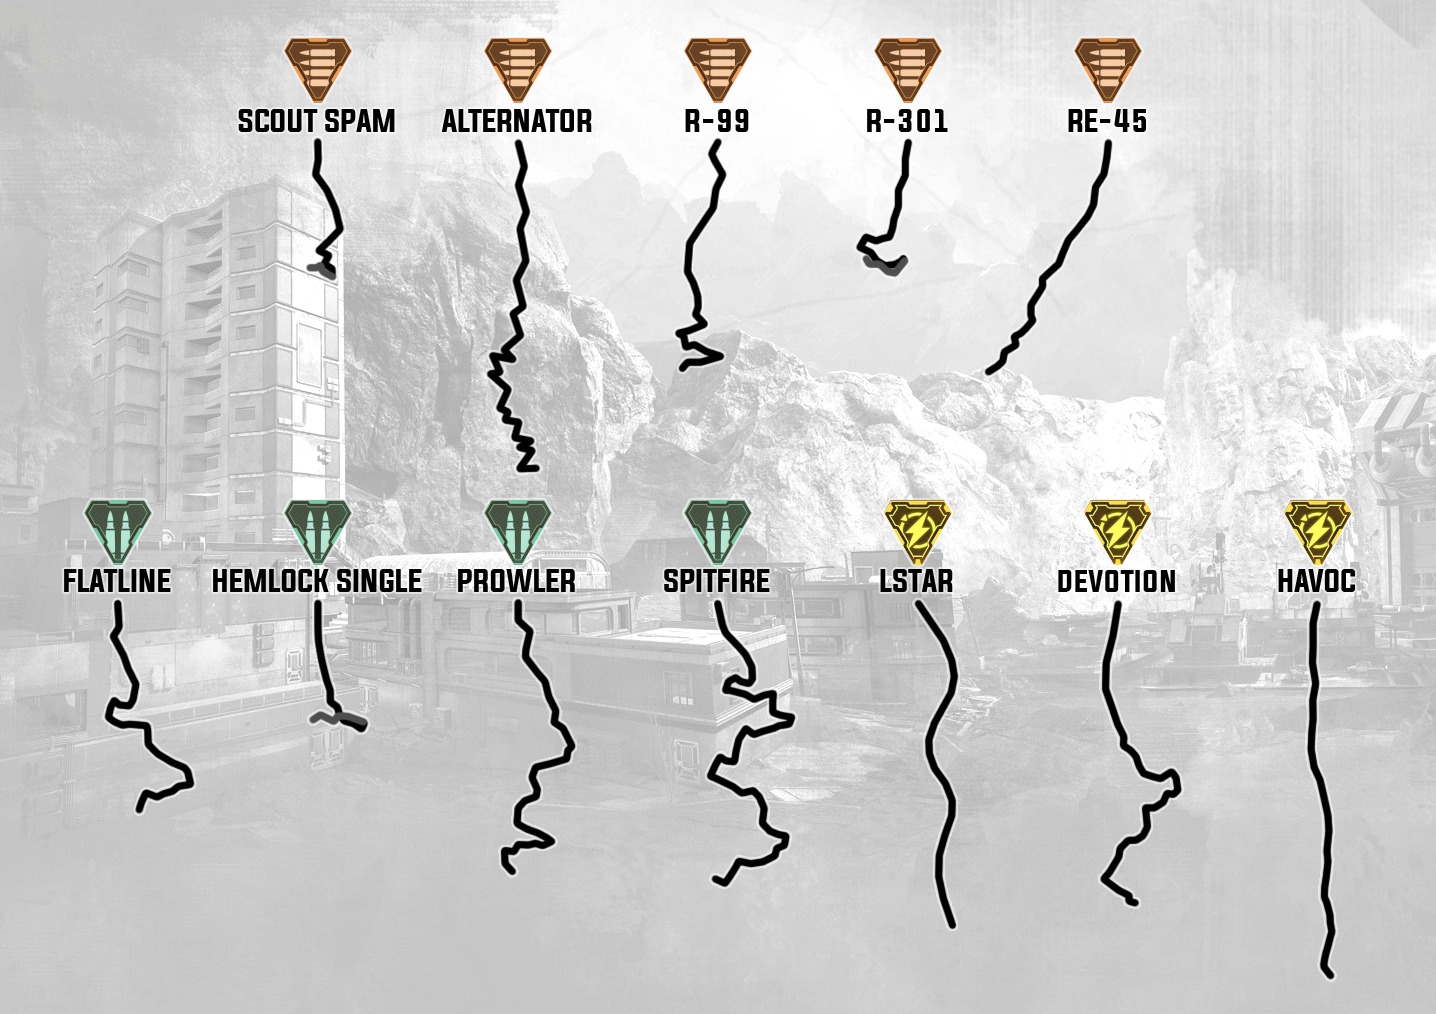 Recoil patterns in Apex Legends.